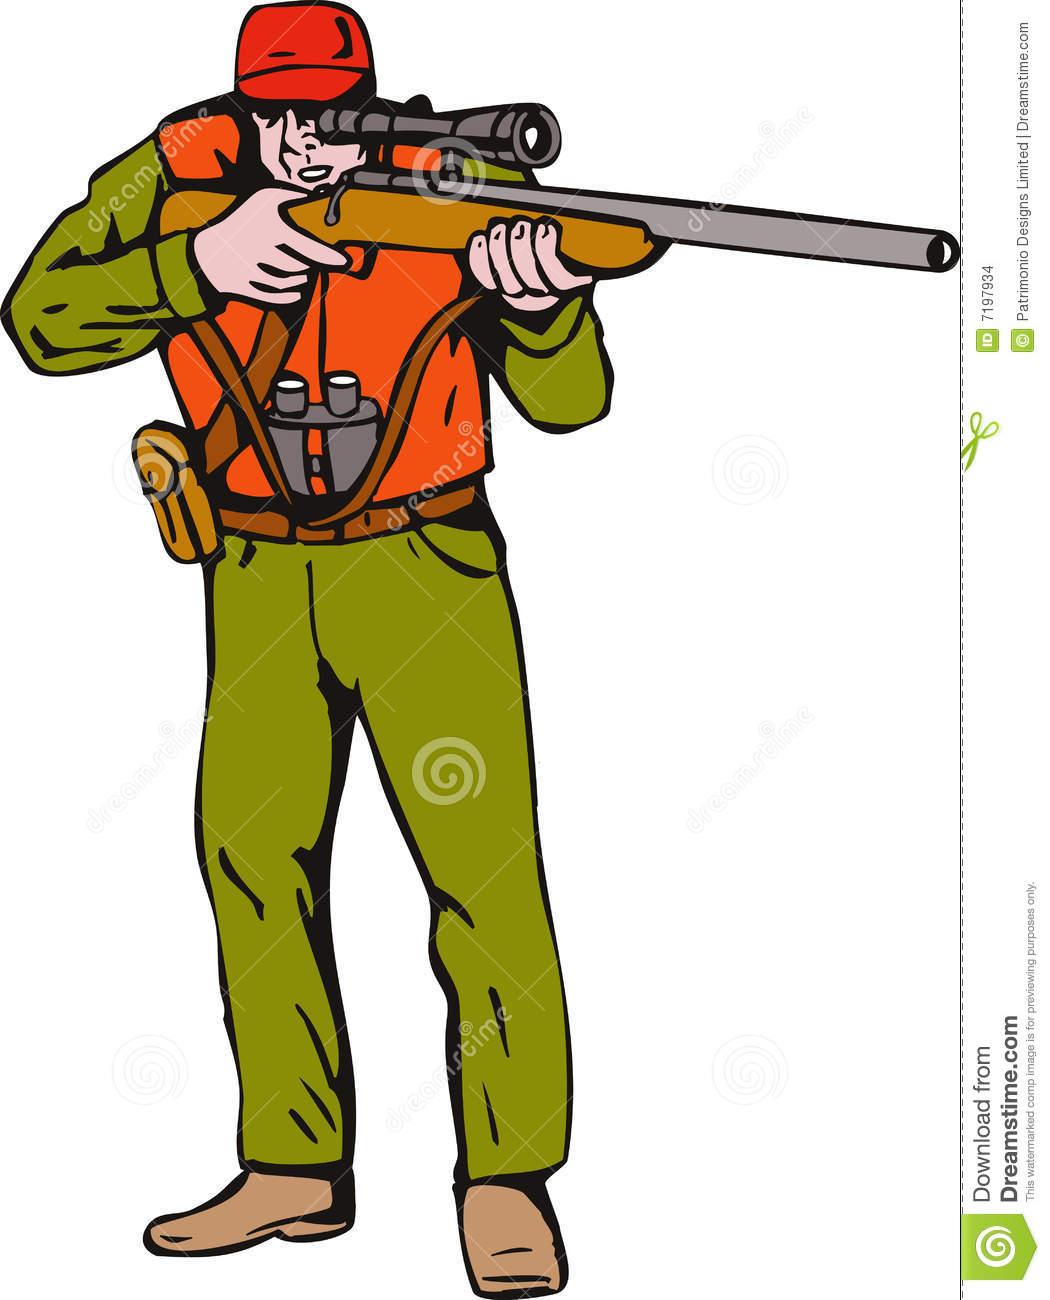 hunter clip art free clipart panda free clipart images rh clipartpanda com fox hunting clipart free Funny Hunting Clip Art